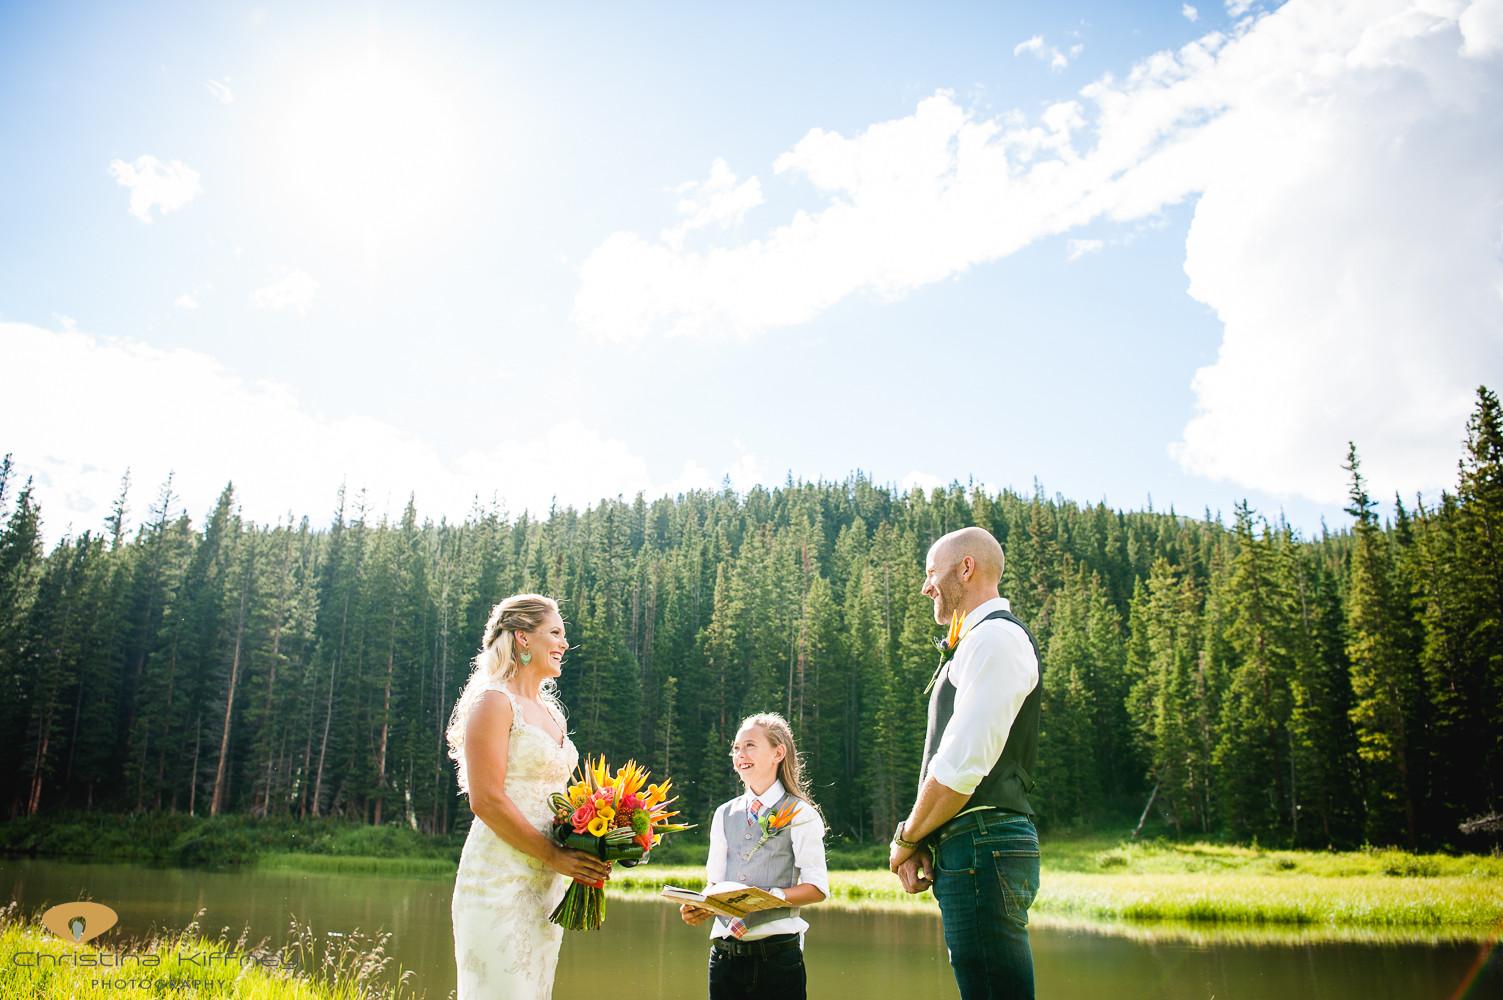 ckp-Colorado-Family-Elopement-0020.jpg